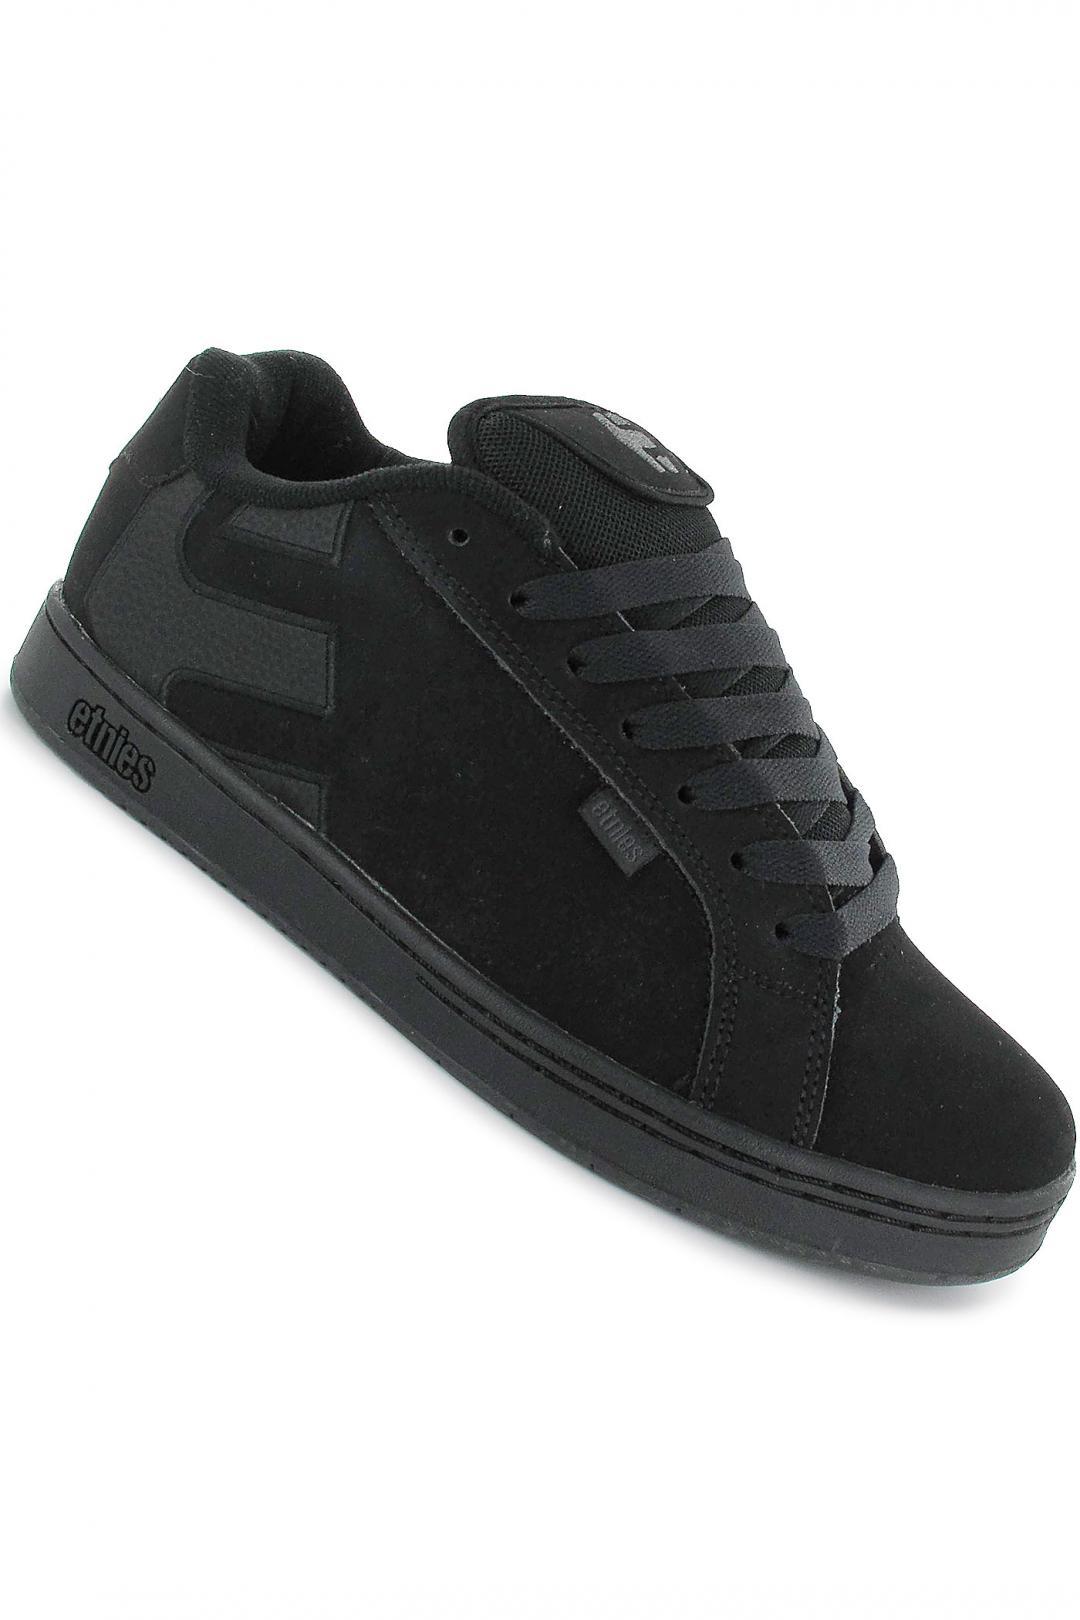 Uomo Etnies Fader black dirty wash | Scarpe da skate